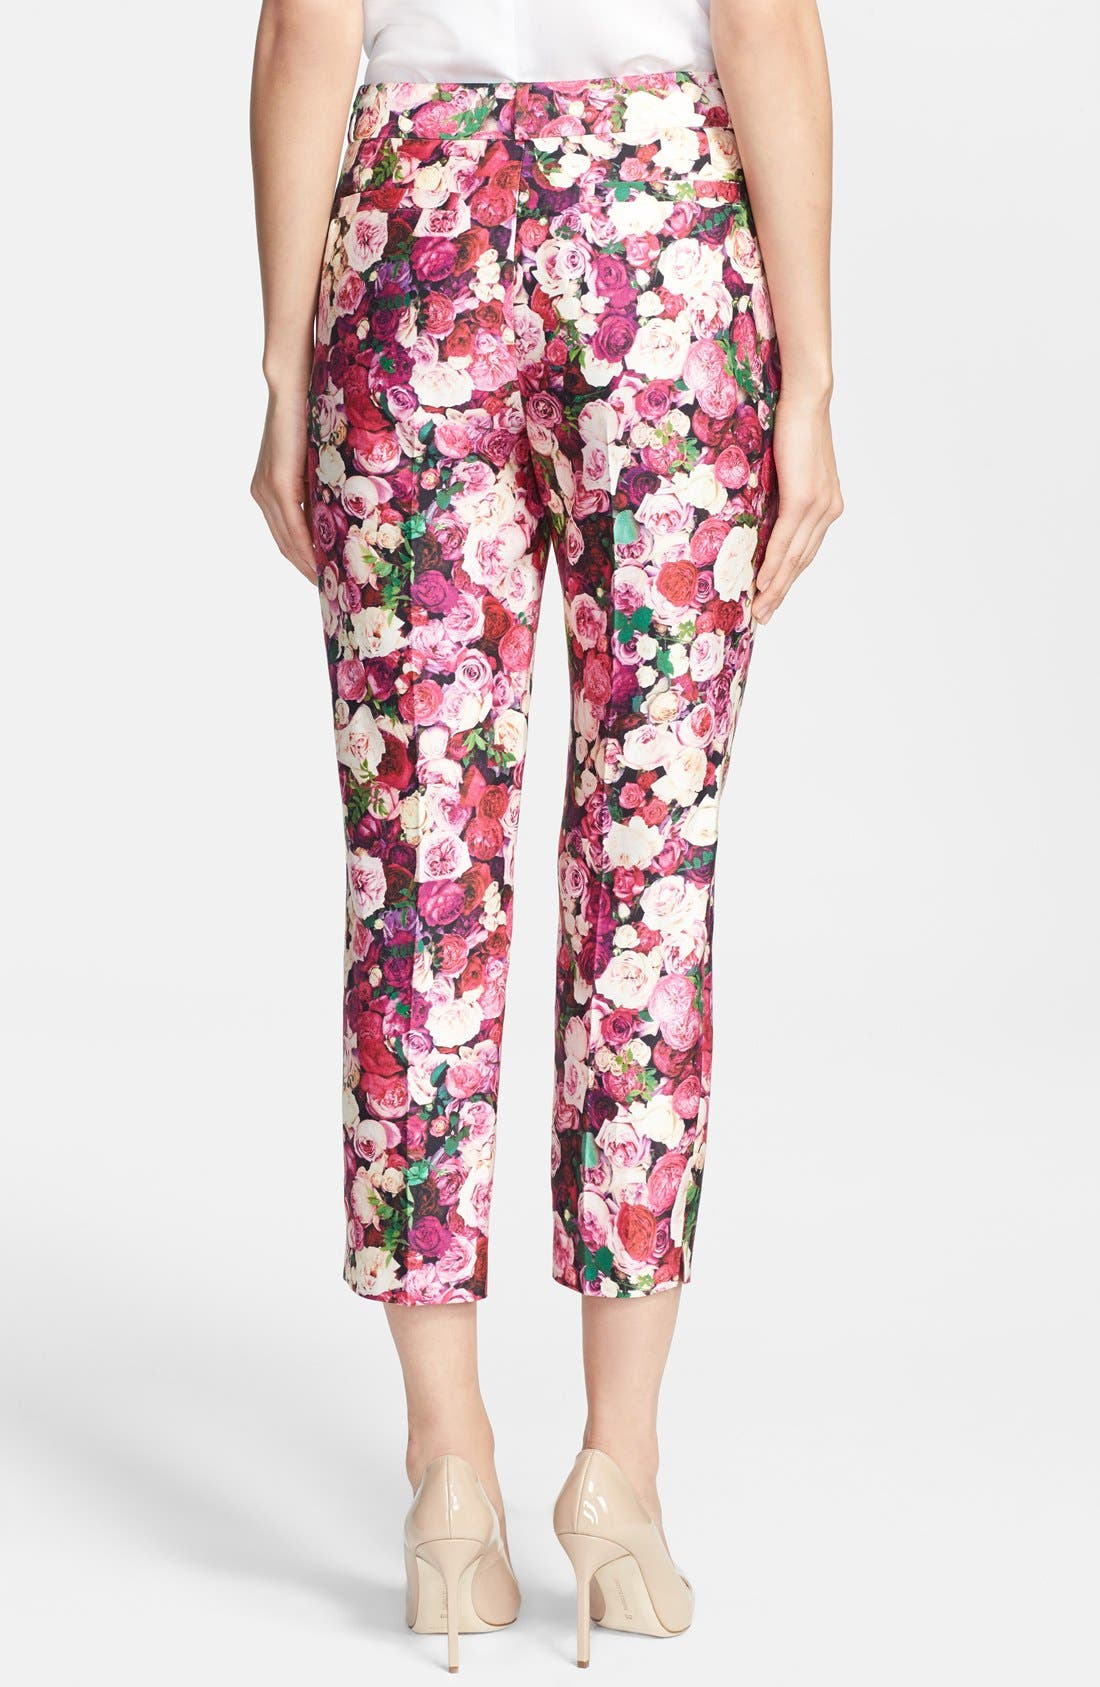 KATE SPADE NEW YORK,                             'jackie' rose print cotton & silk capri pants,                             Alternate thumbnail 2, color,                             655